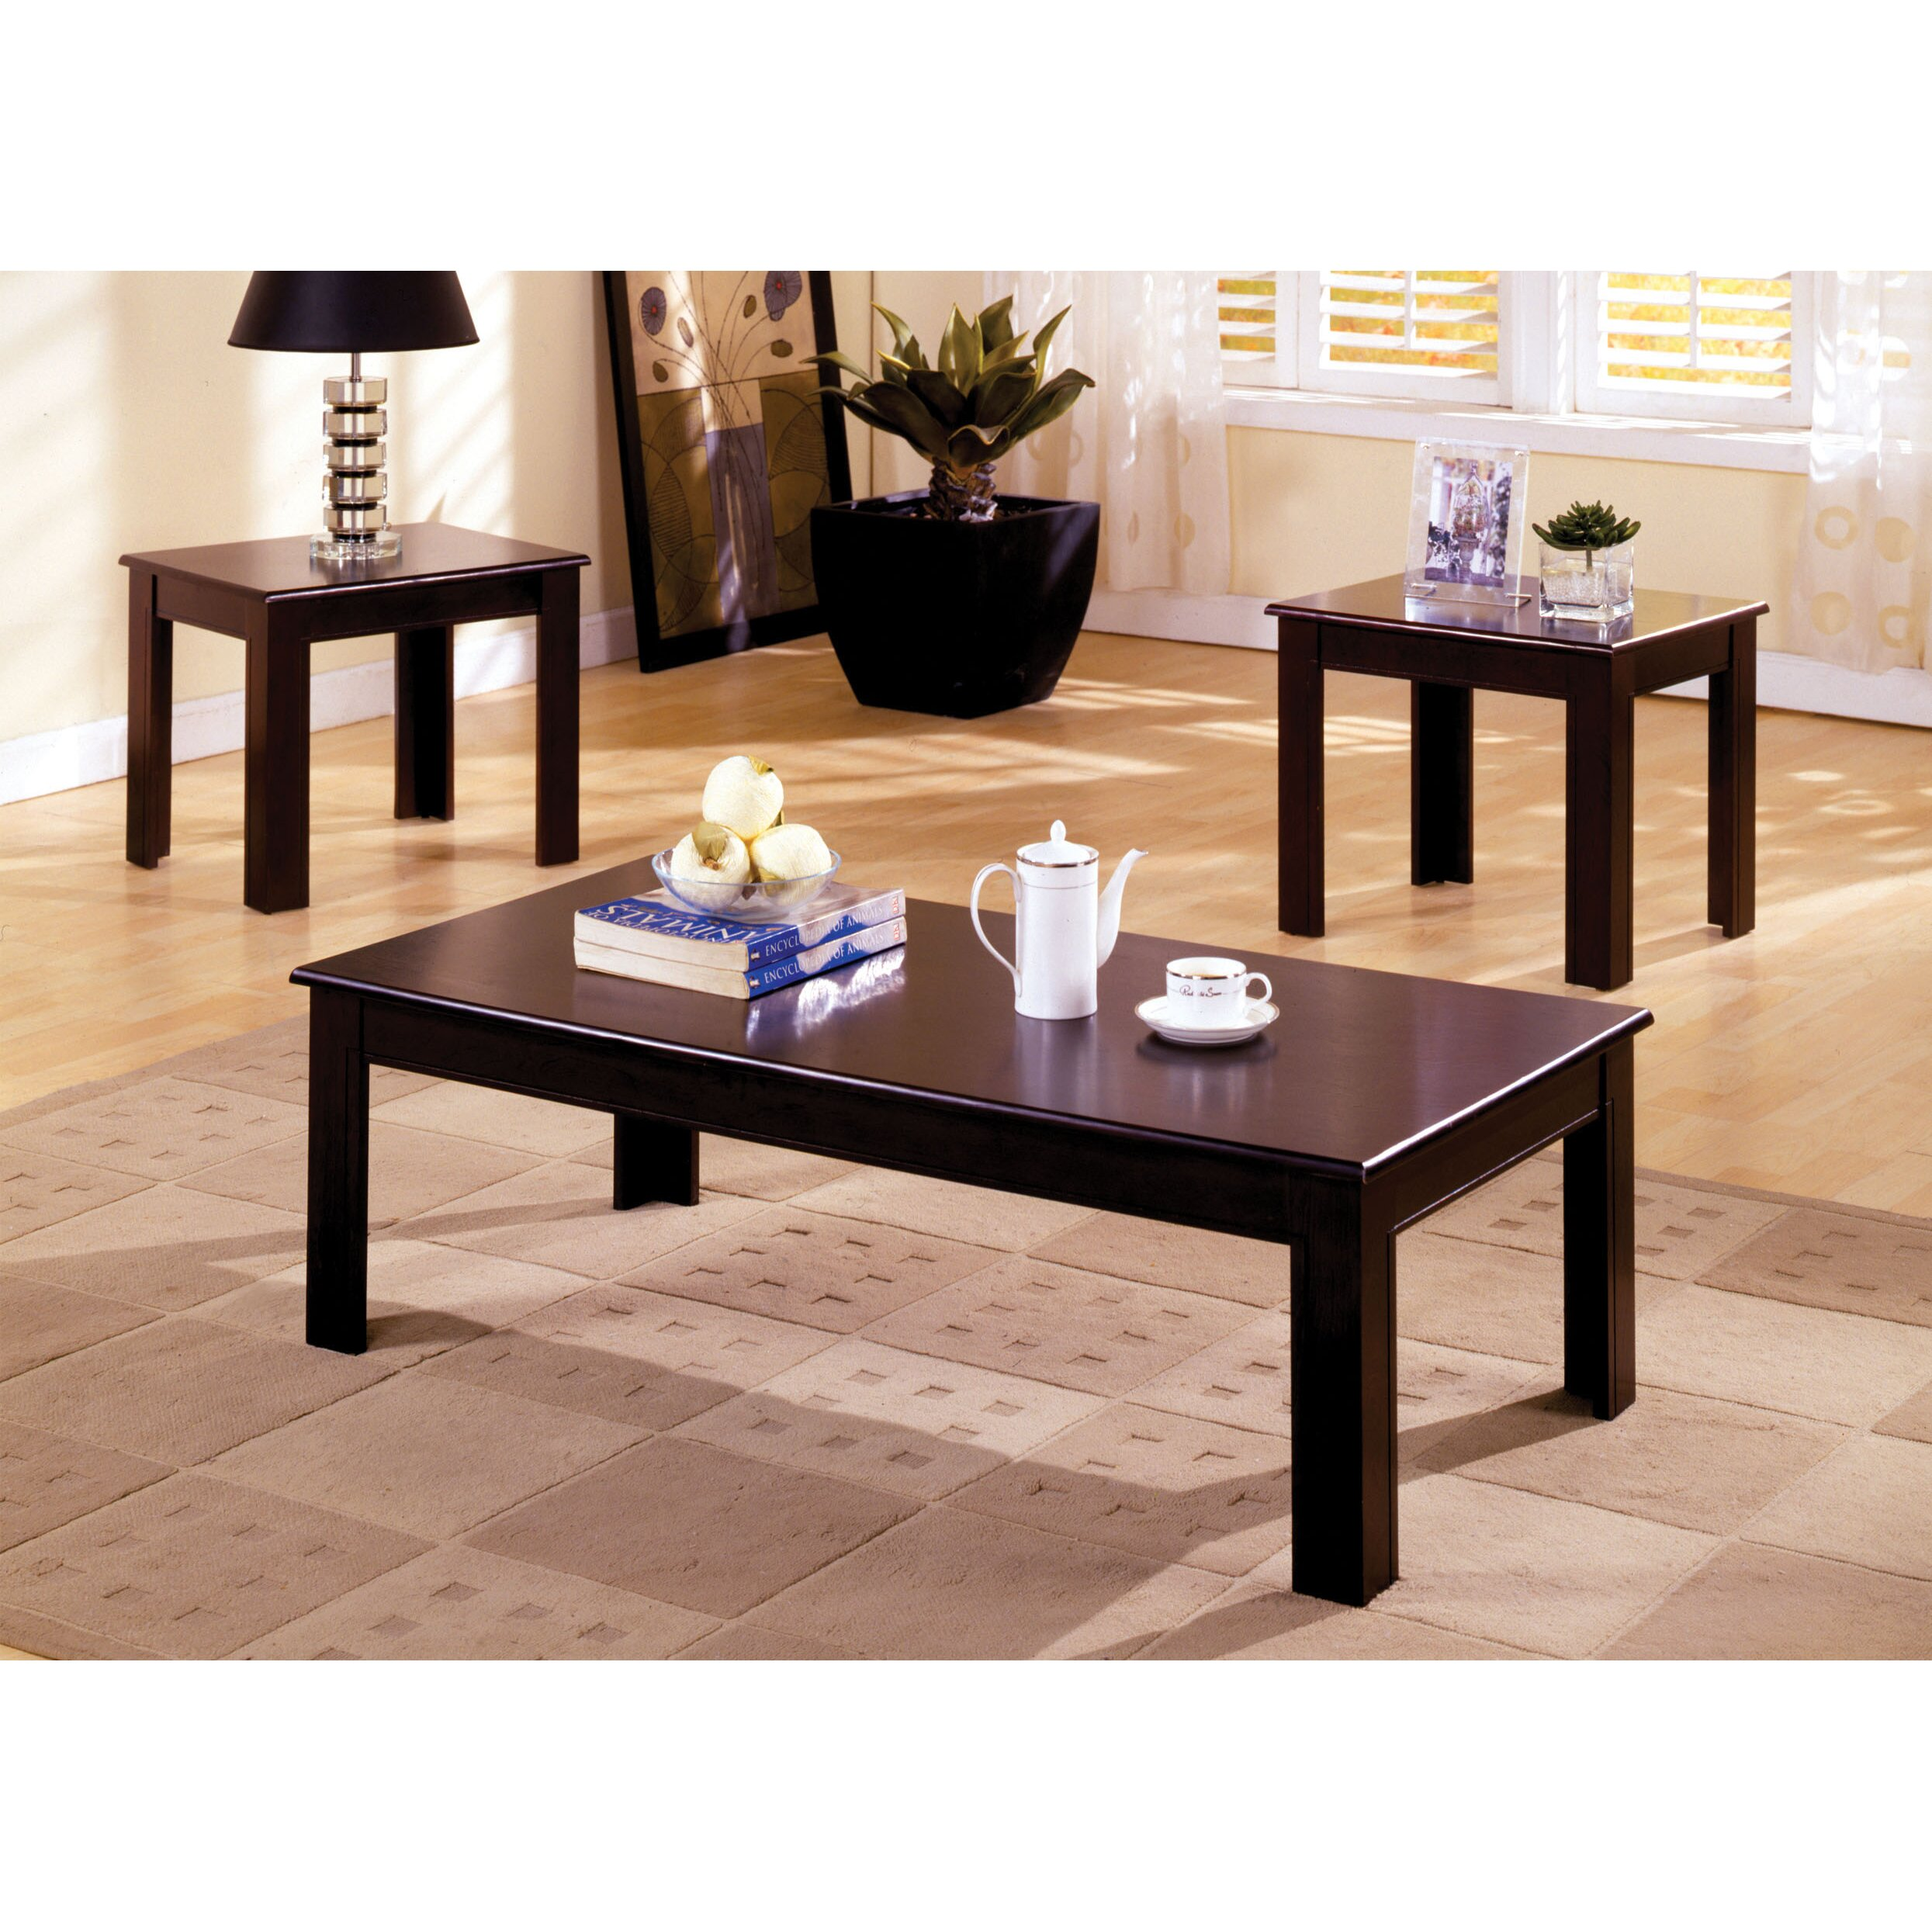 Hokku Designs Frixe 3 Piece Coffee Table Set Reviews Wayfair